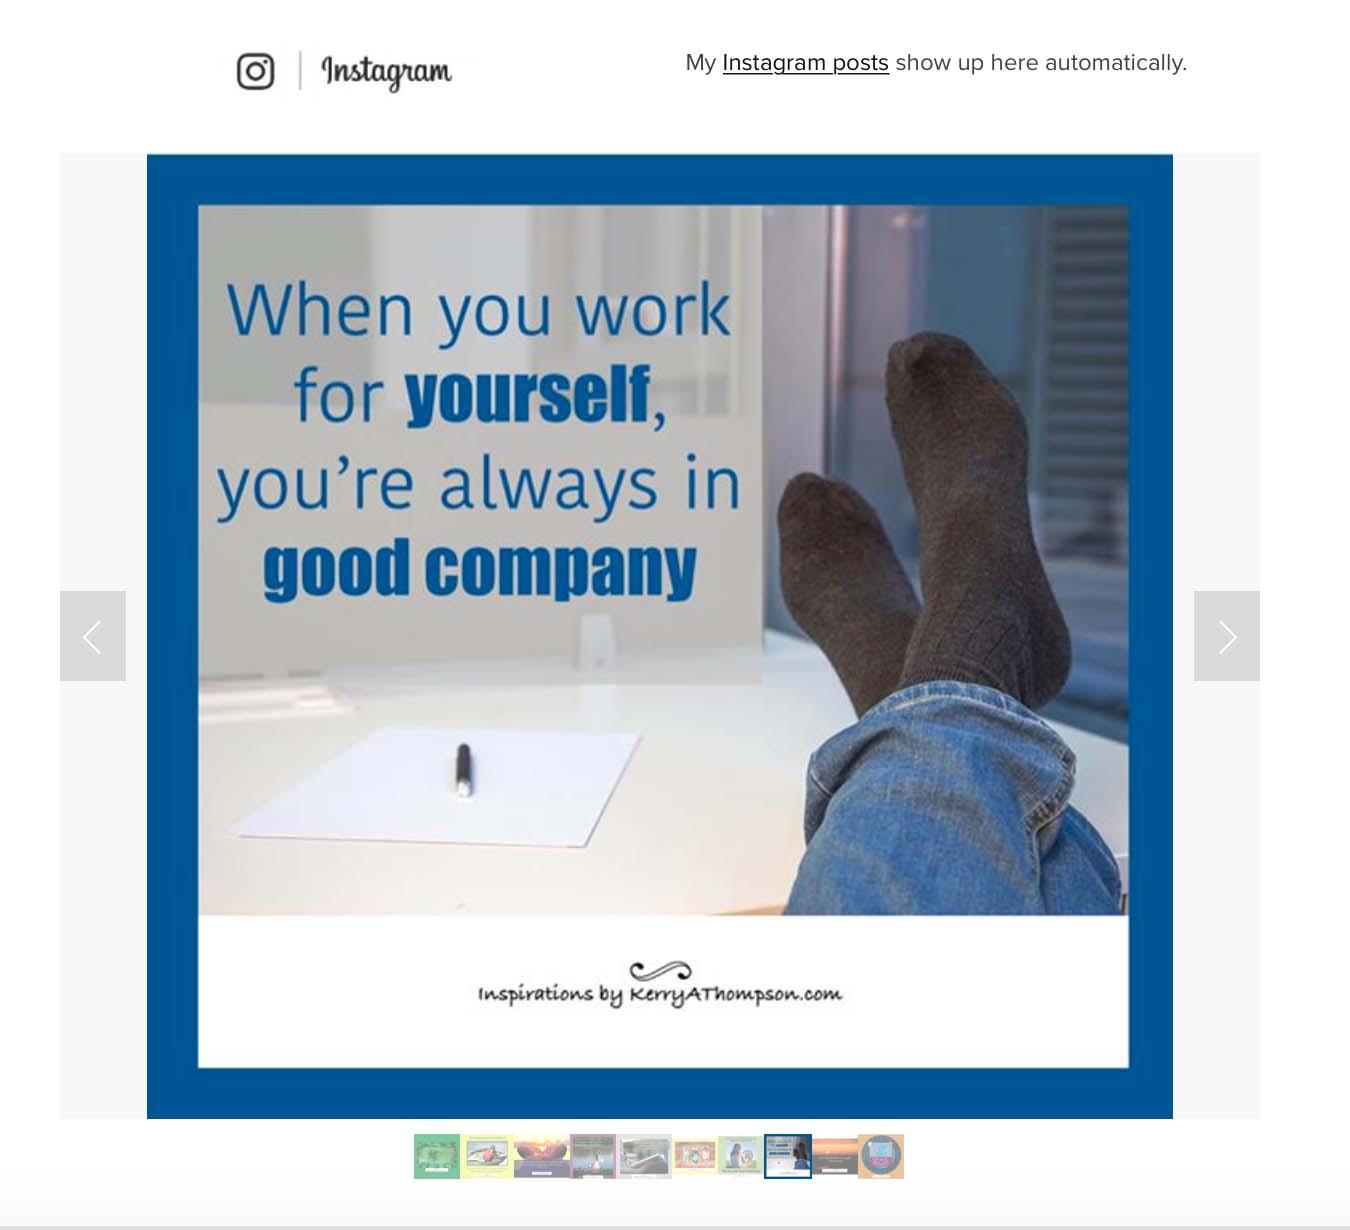 The Instagram feed block on my Squarespace website shows my latest Instagram posts (KerryAThompson.com)